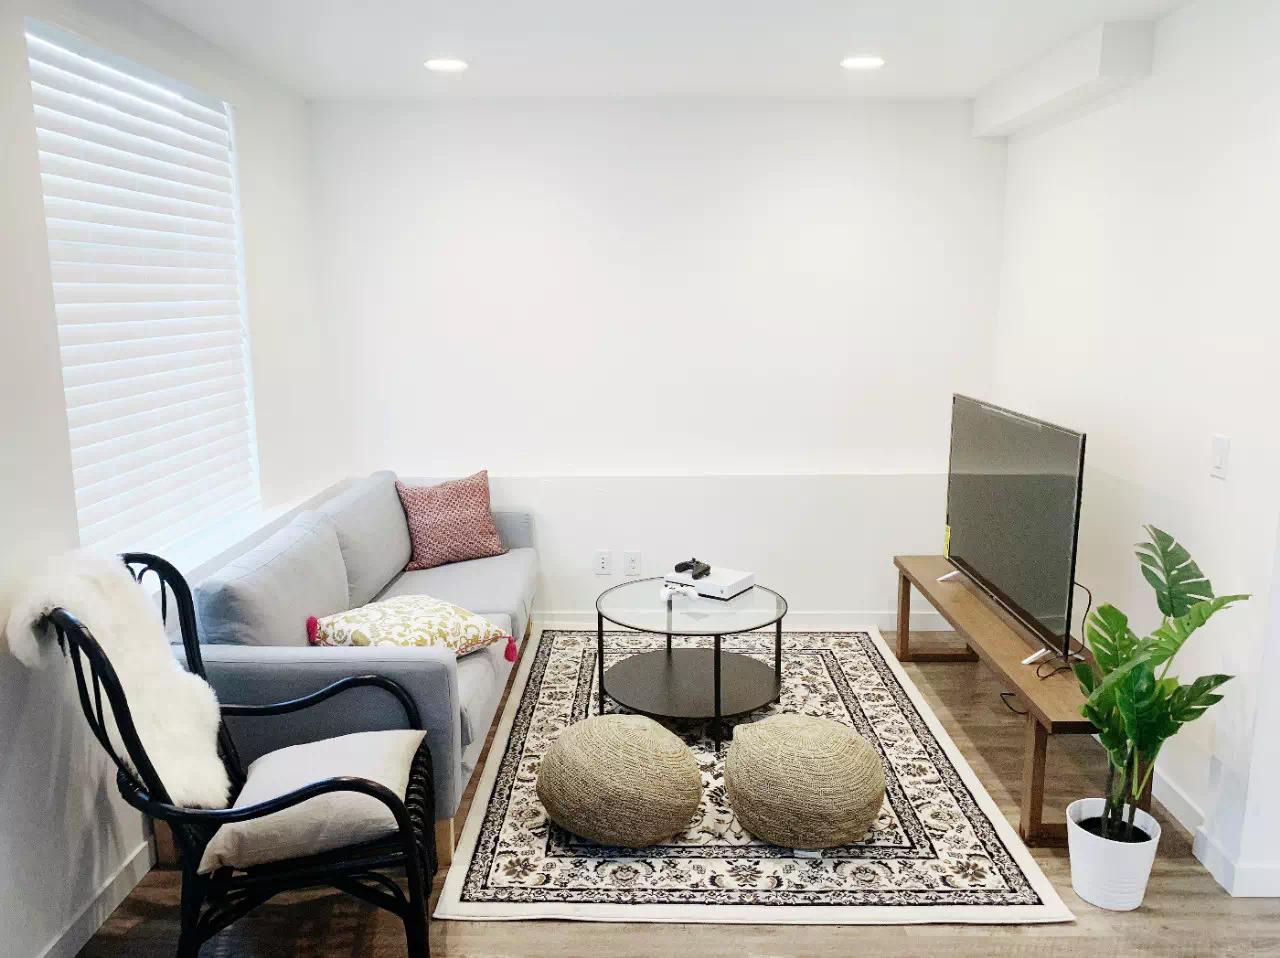 living room space, small green plant, sofa and flatscreen tv